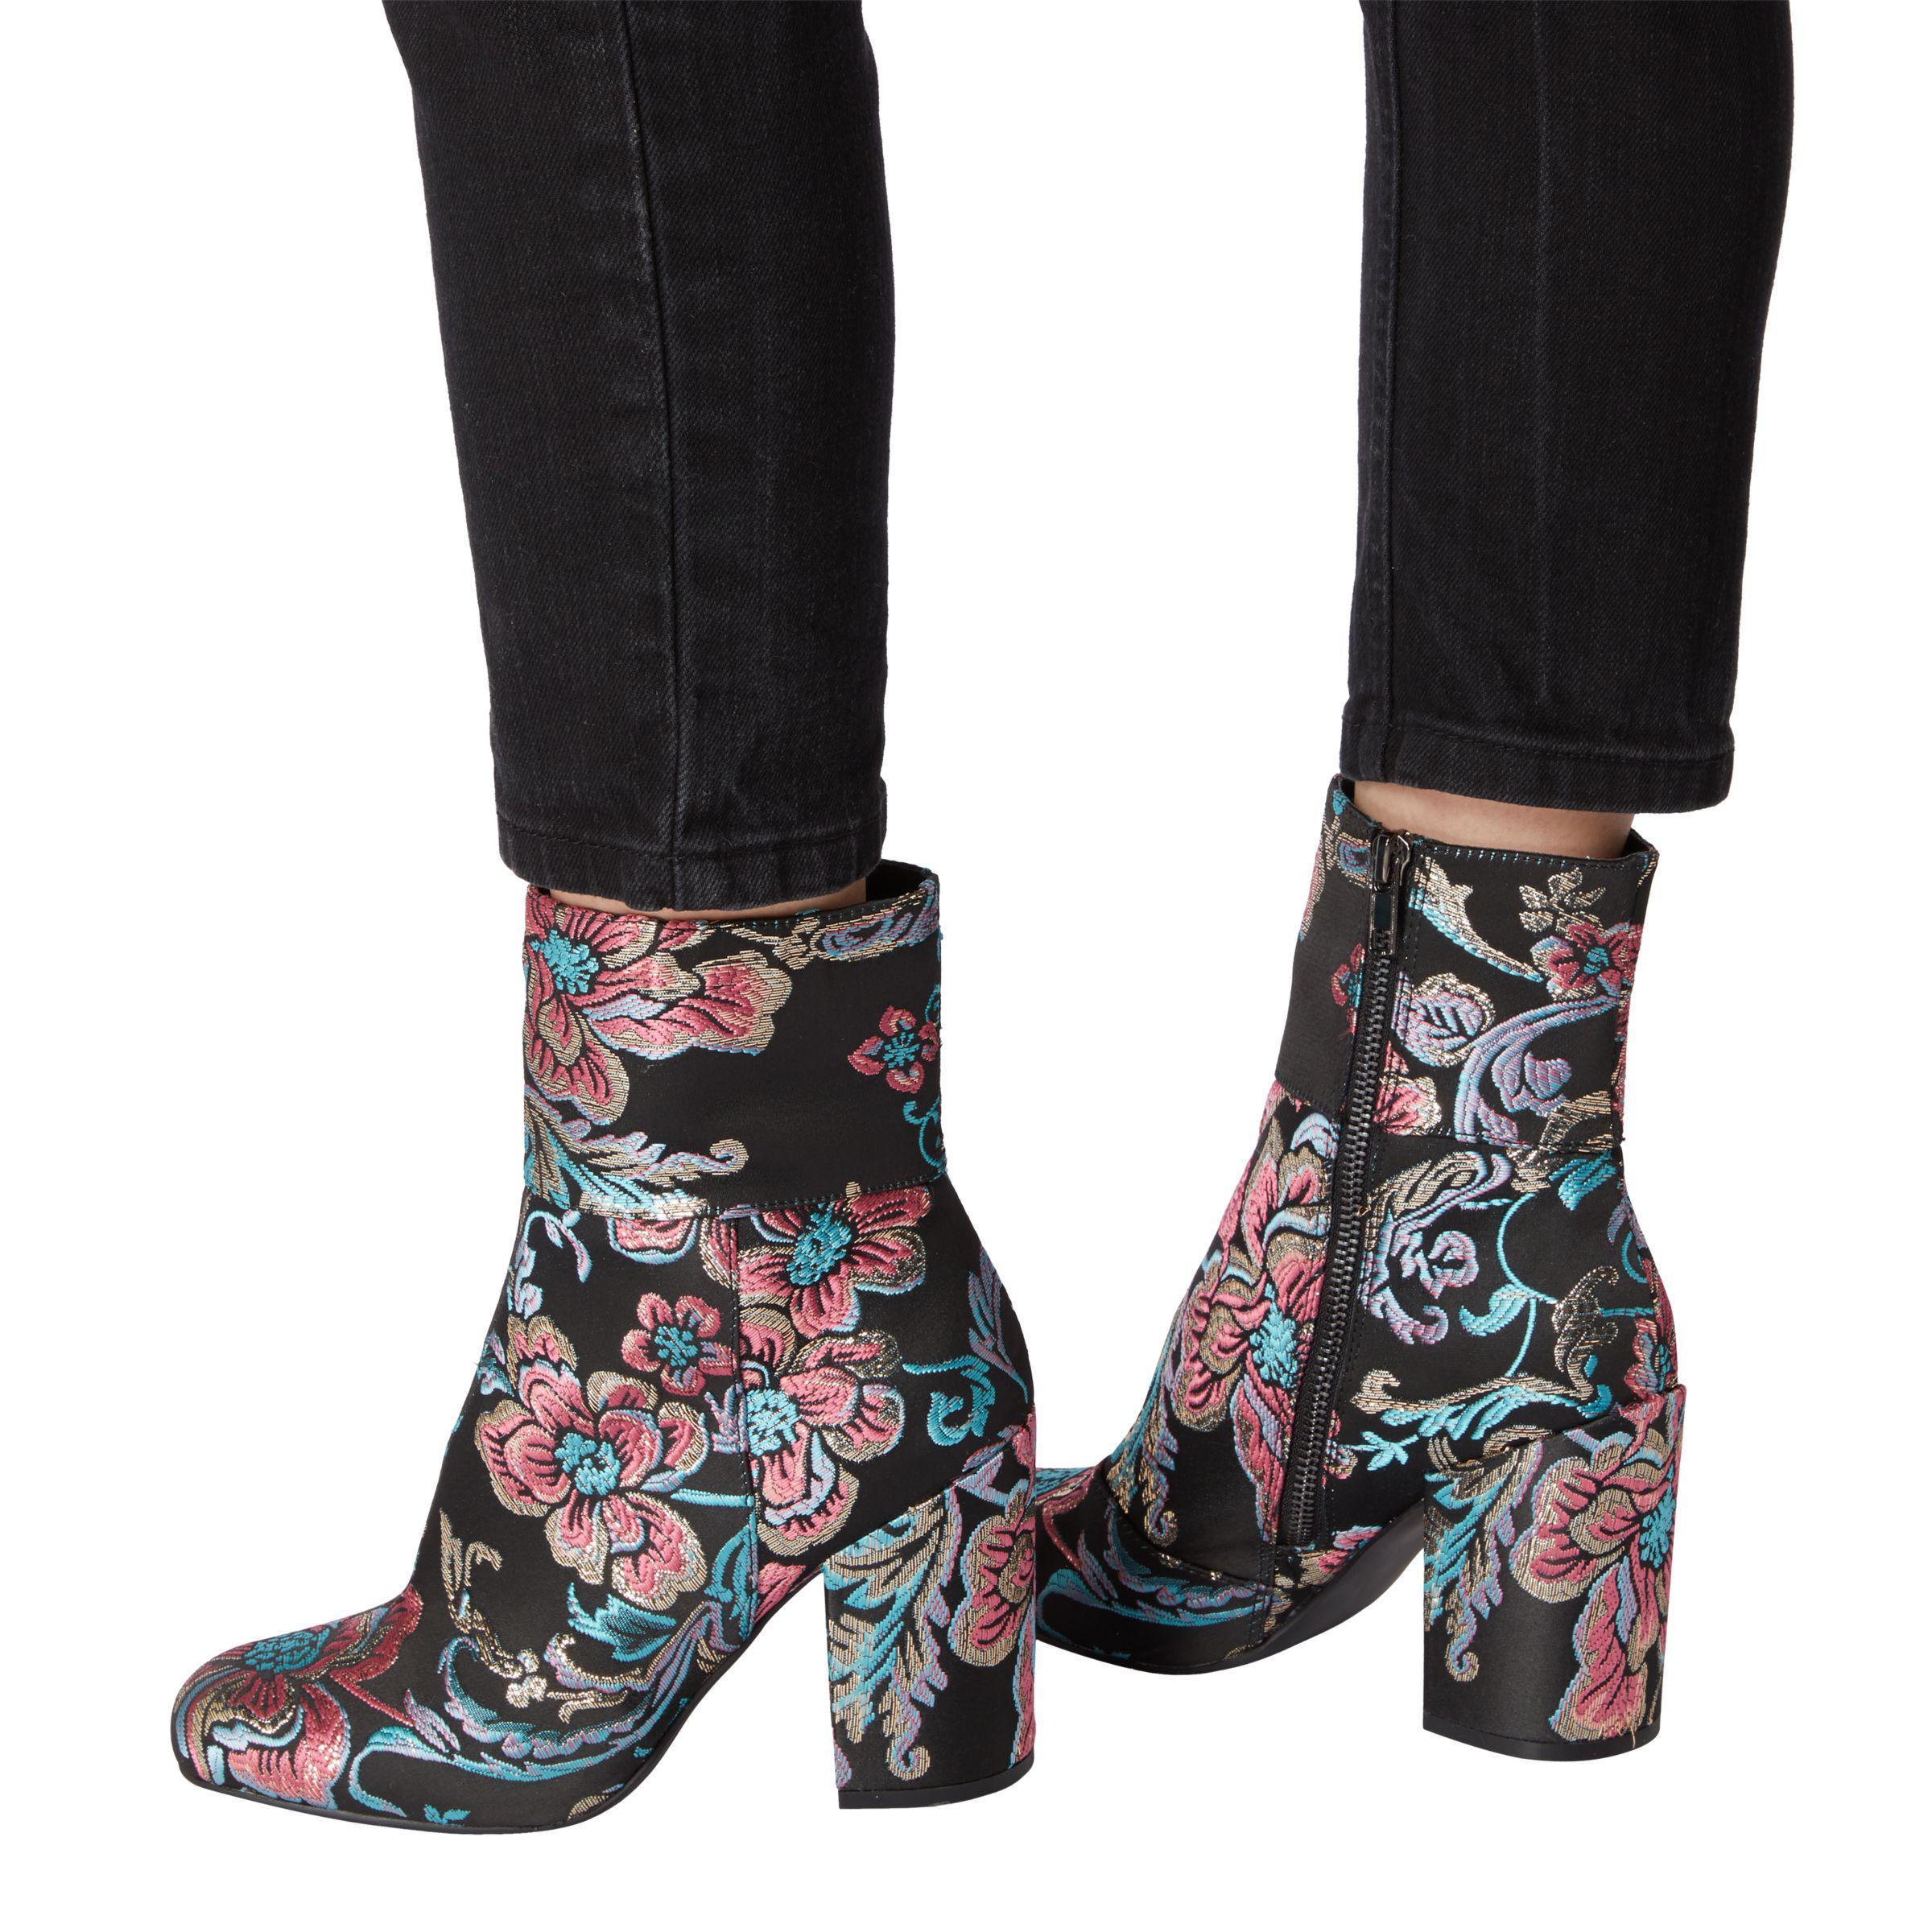 7161180b7ba Steve Madden Goldie Block Heel Ankle Boots - Lyst